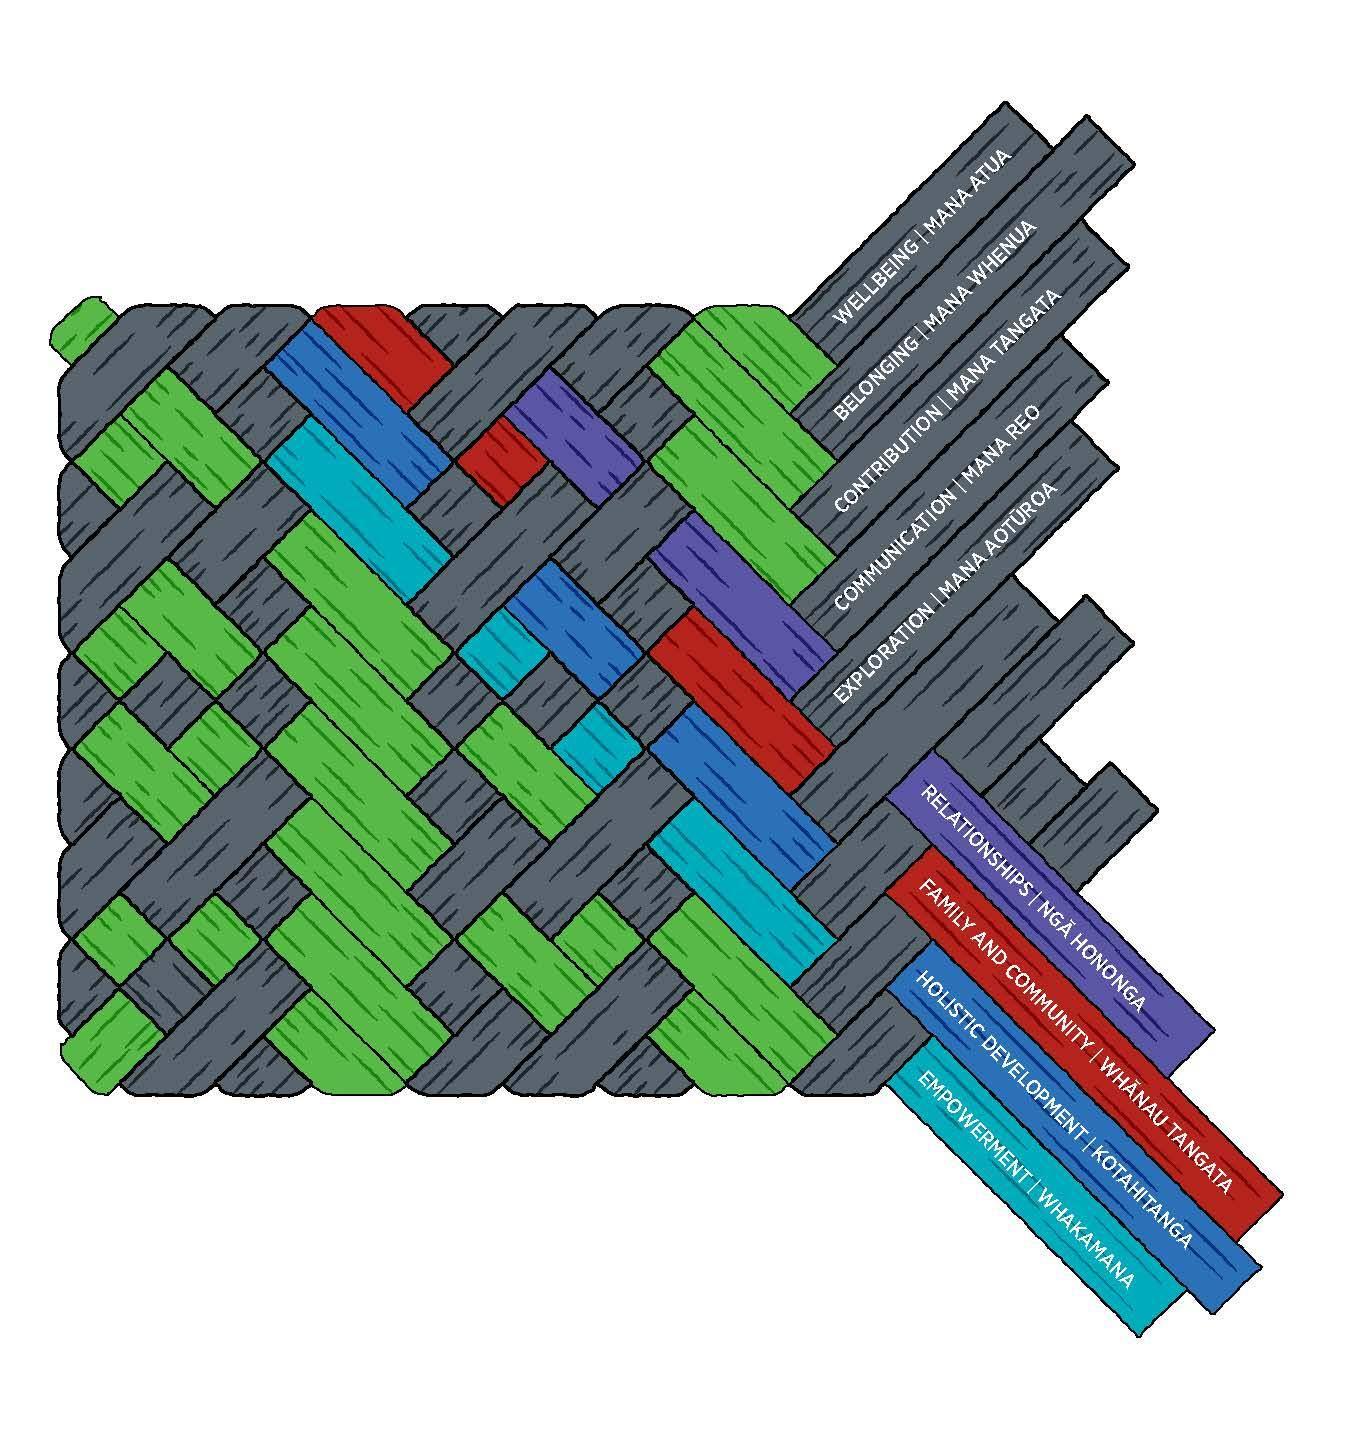 te-whariki-diagram-for-ece-nz